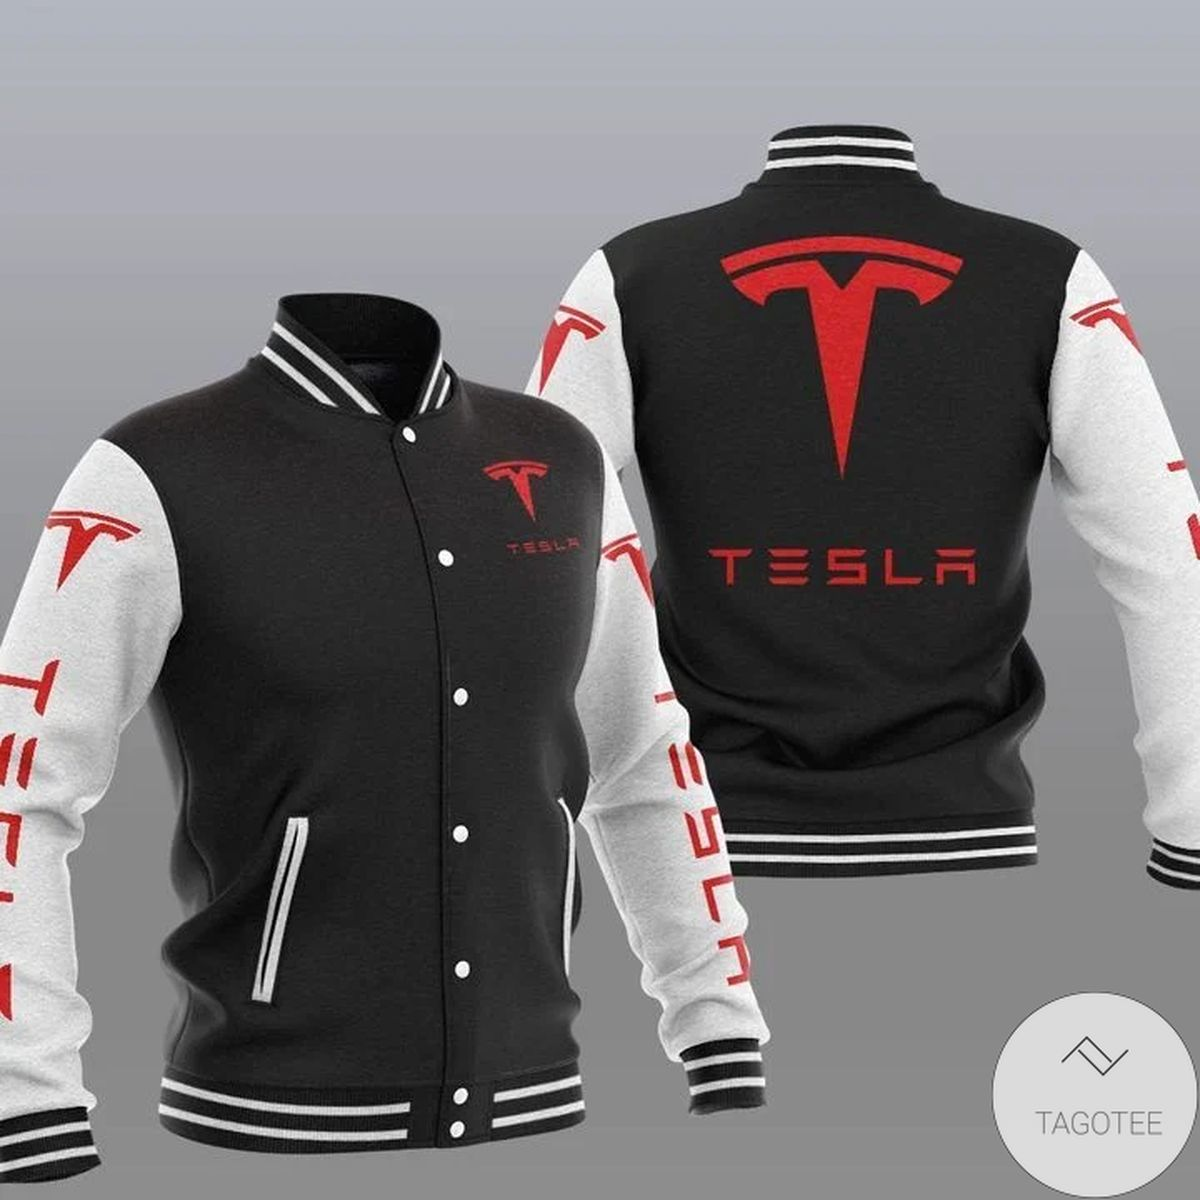 Tesla Varsity Baseball Jacket